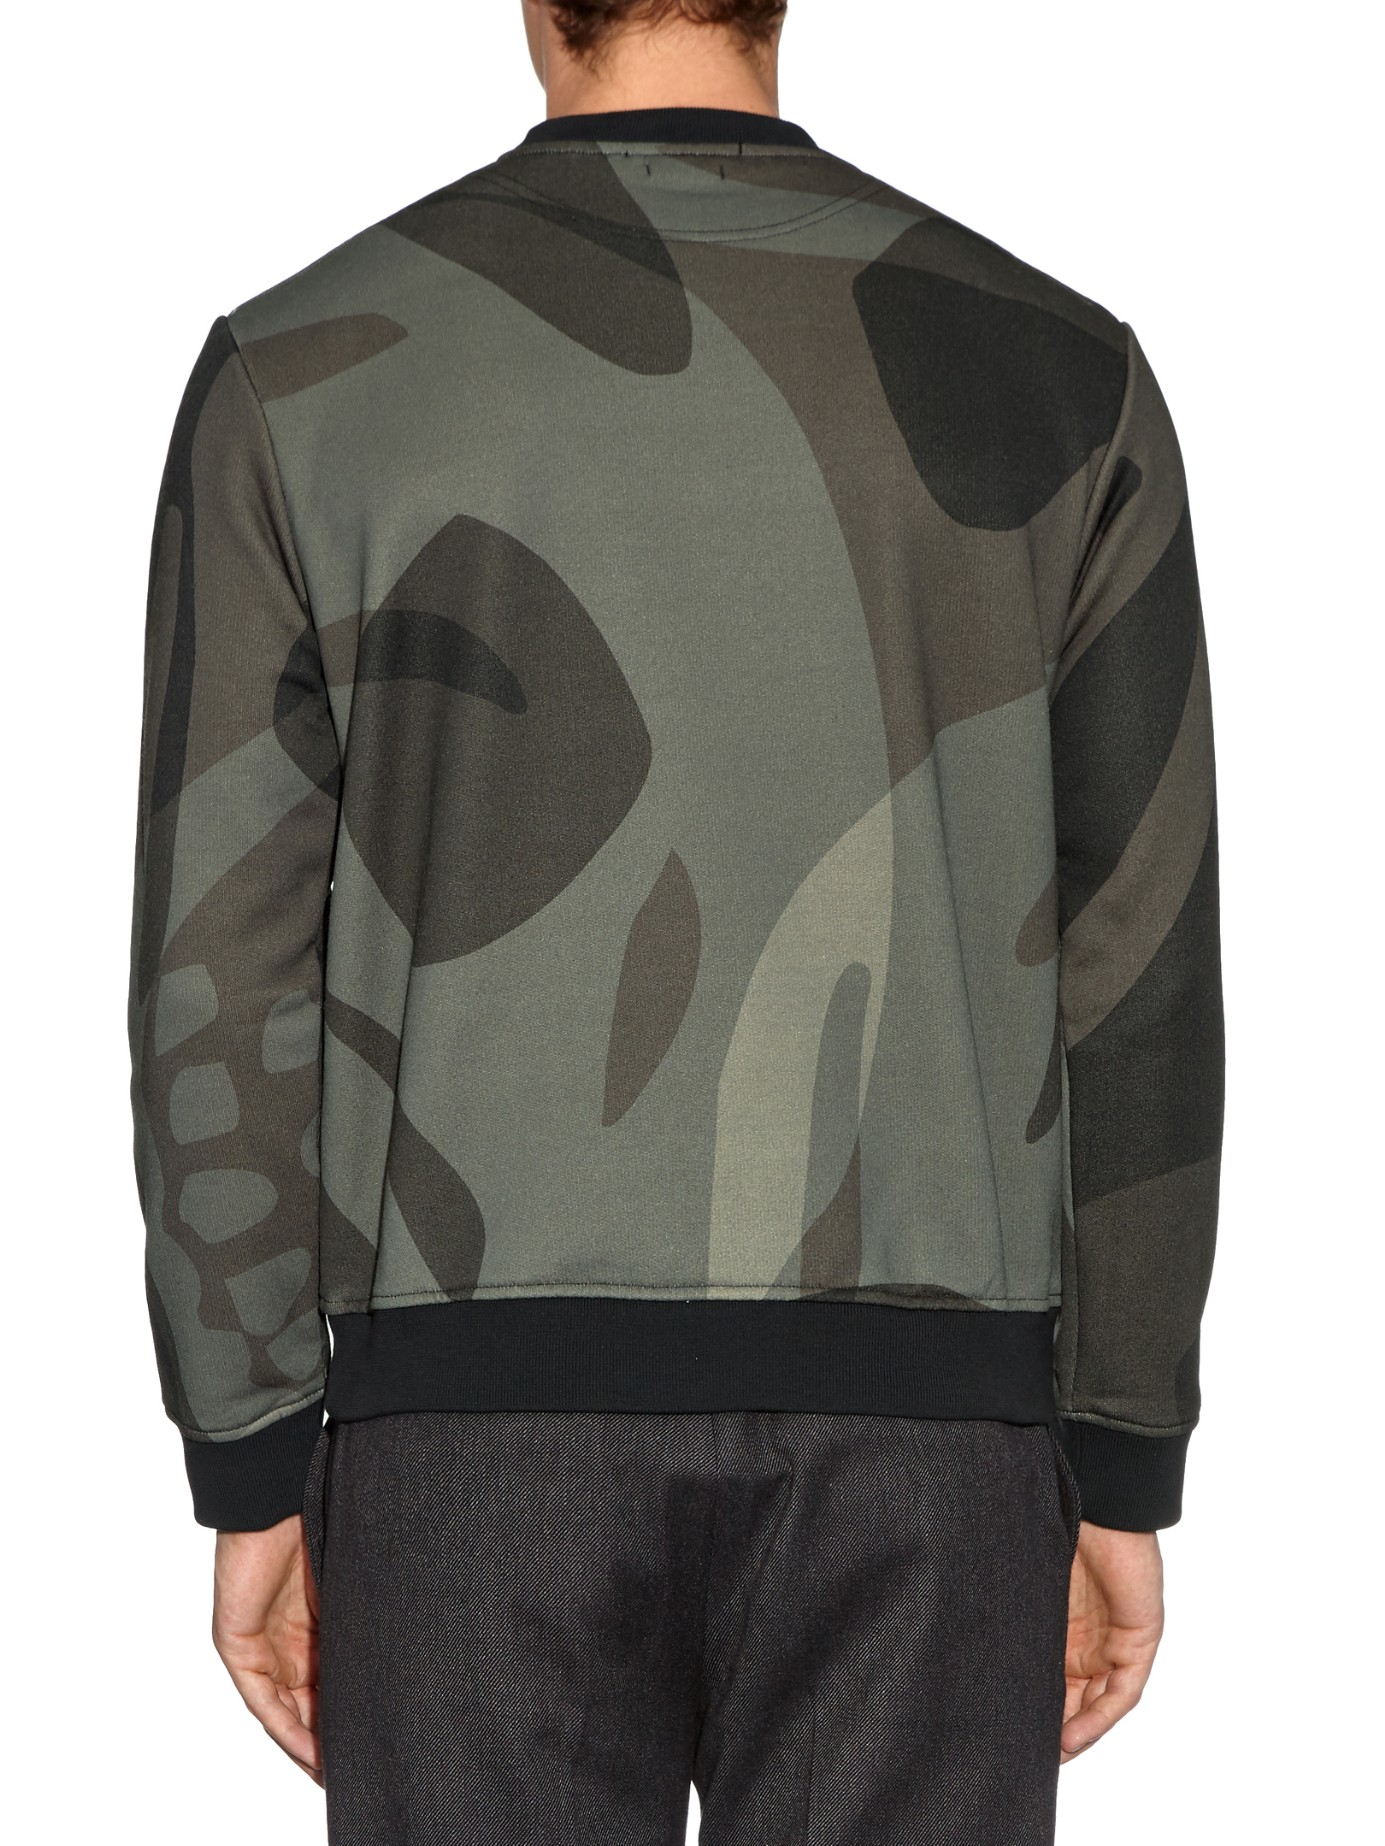 alexander mcqueen skull camouflage print sweatshirt in natural for men lyst. Black Bedroom Furniture Sets. Home Design Ideas